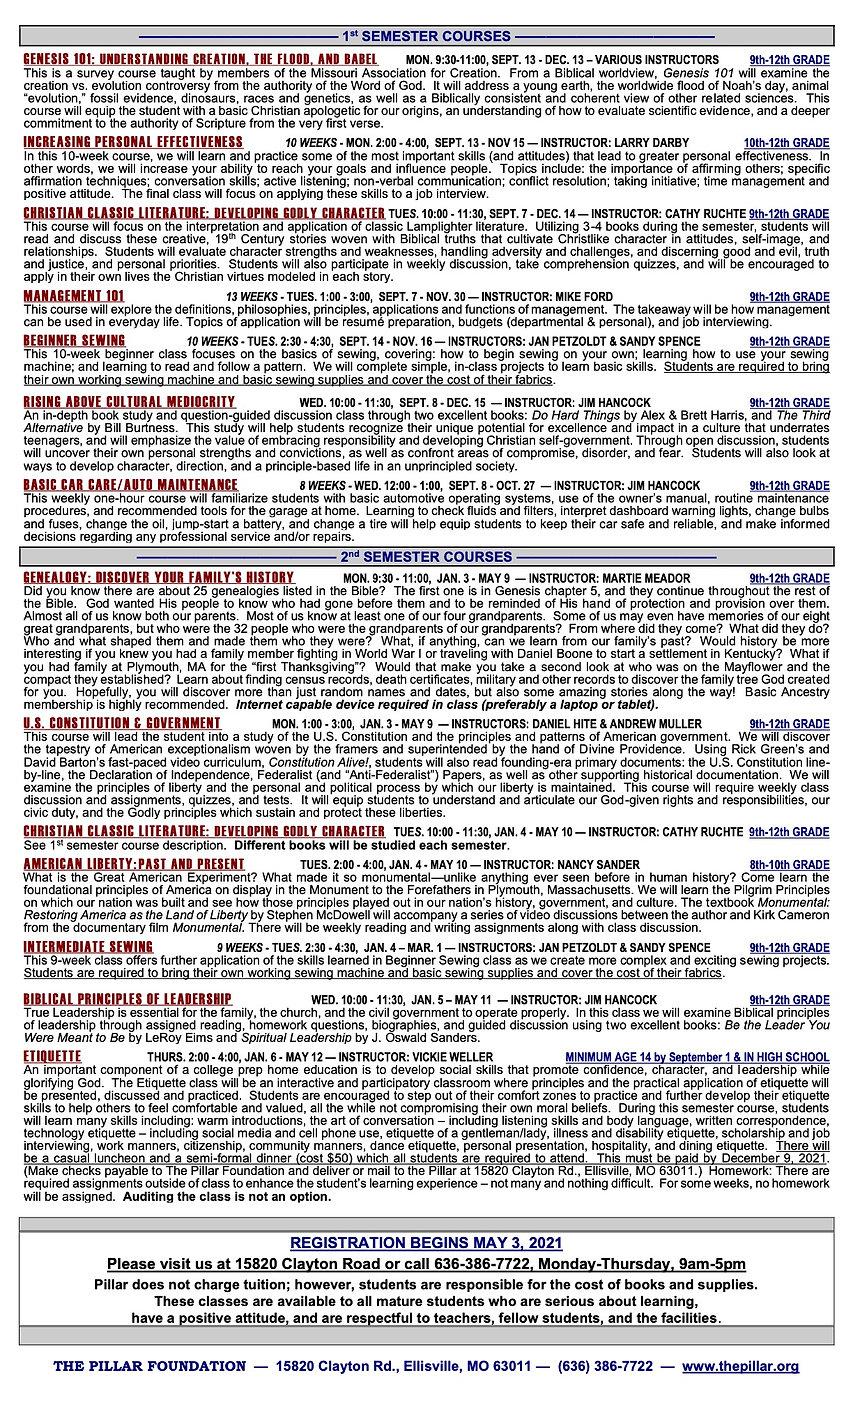 2021-22 Class Schedule2.jpg